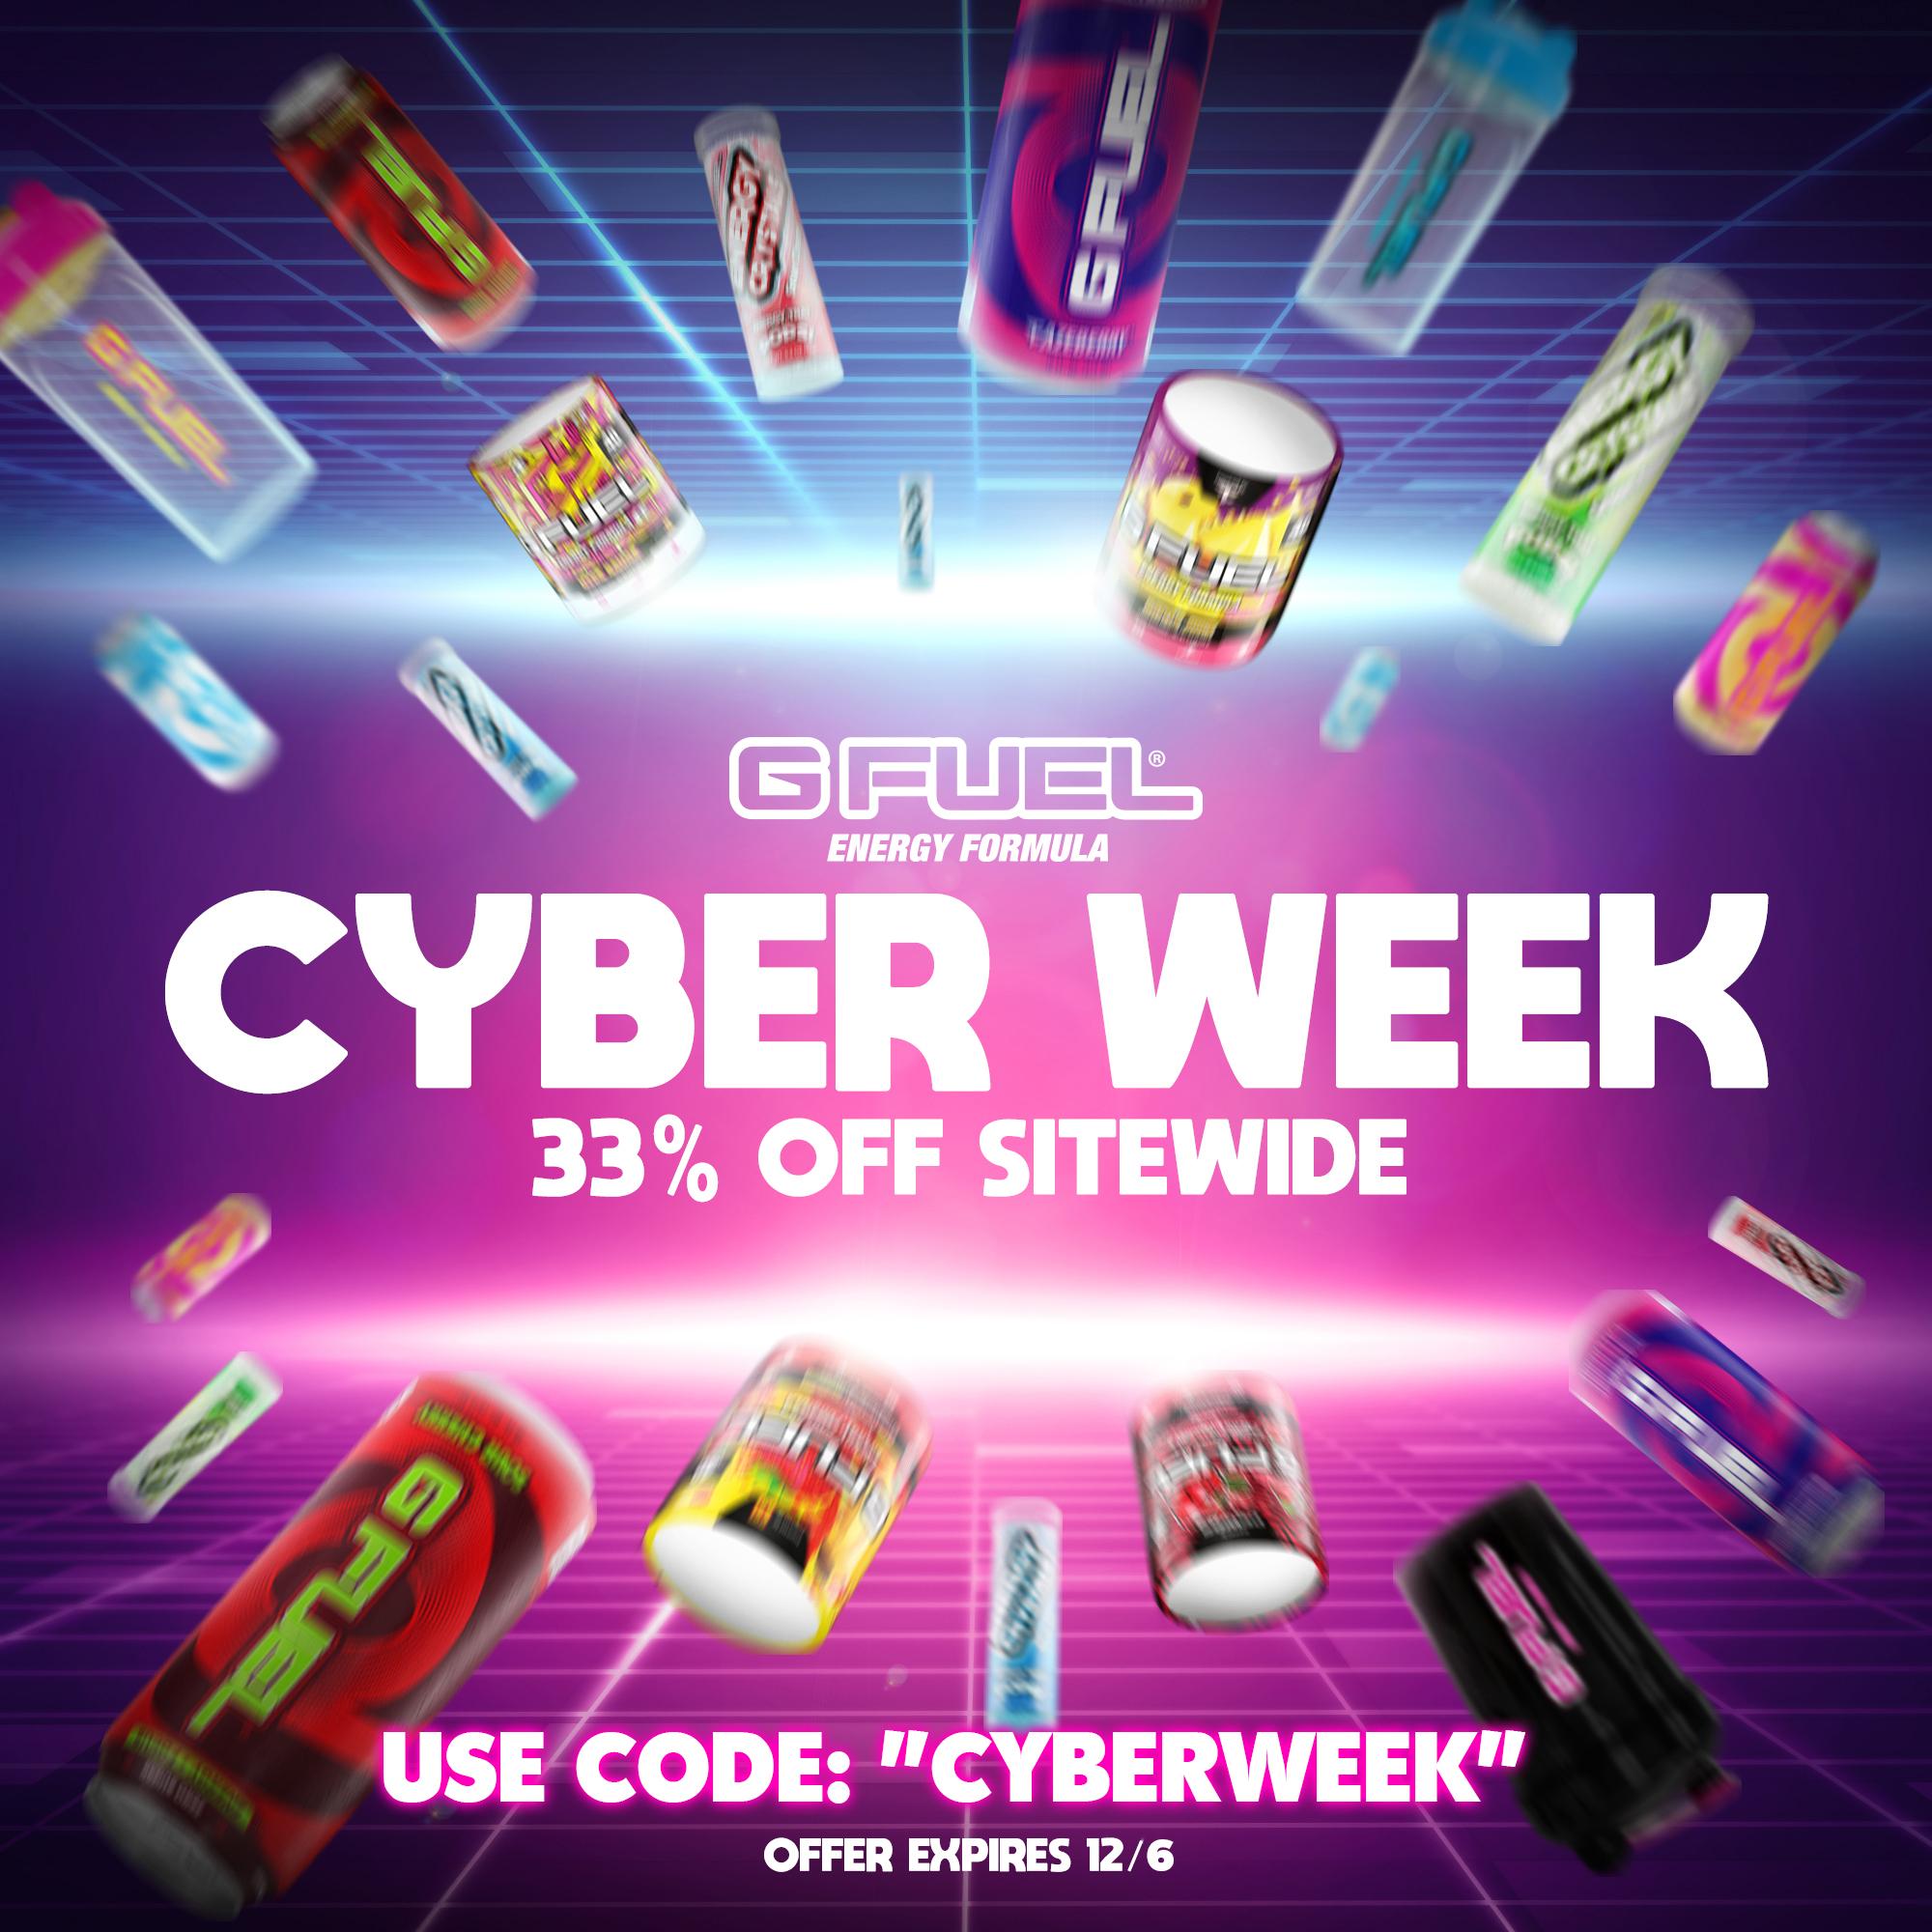 GFL-CyberWeek-ProdBurst